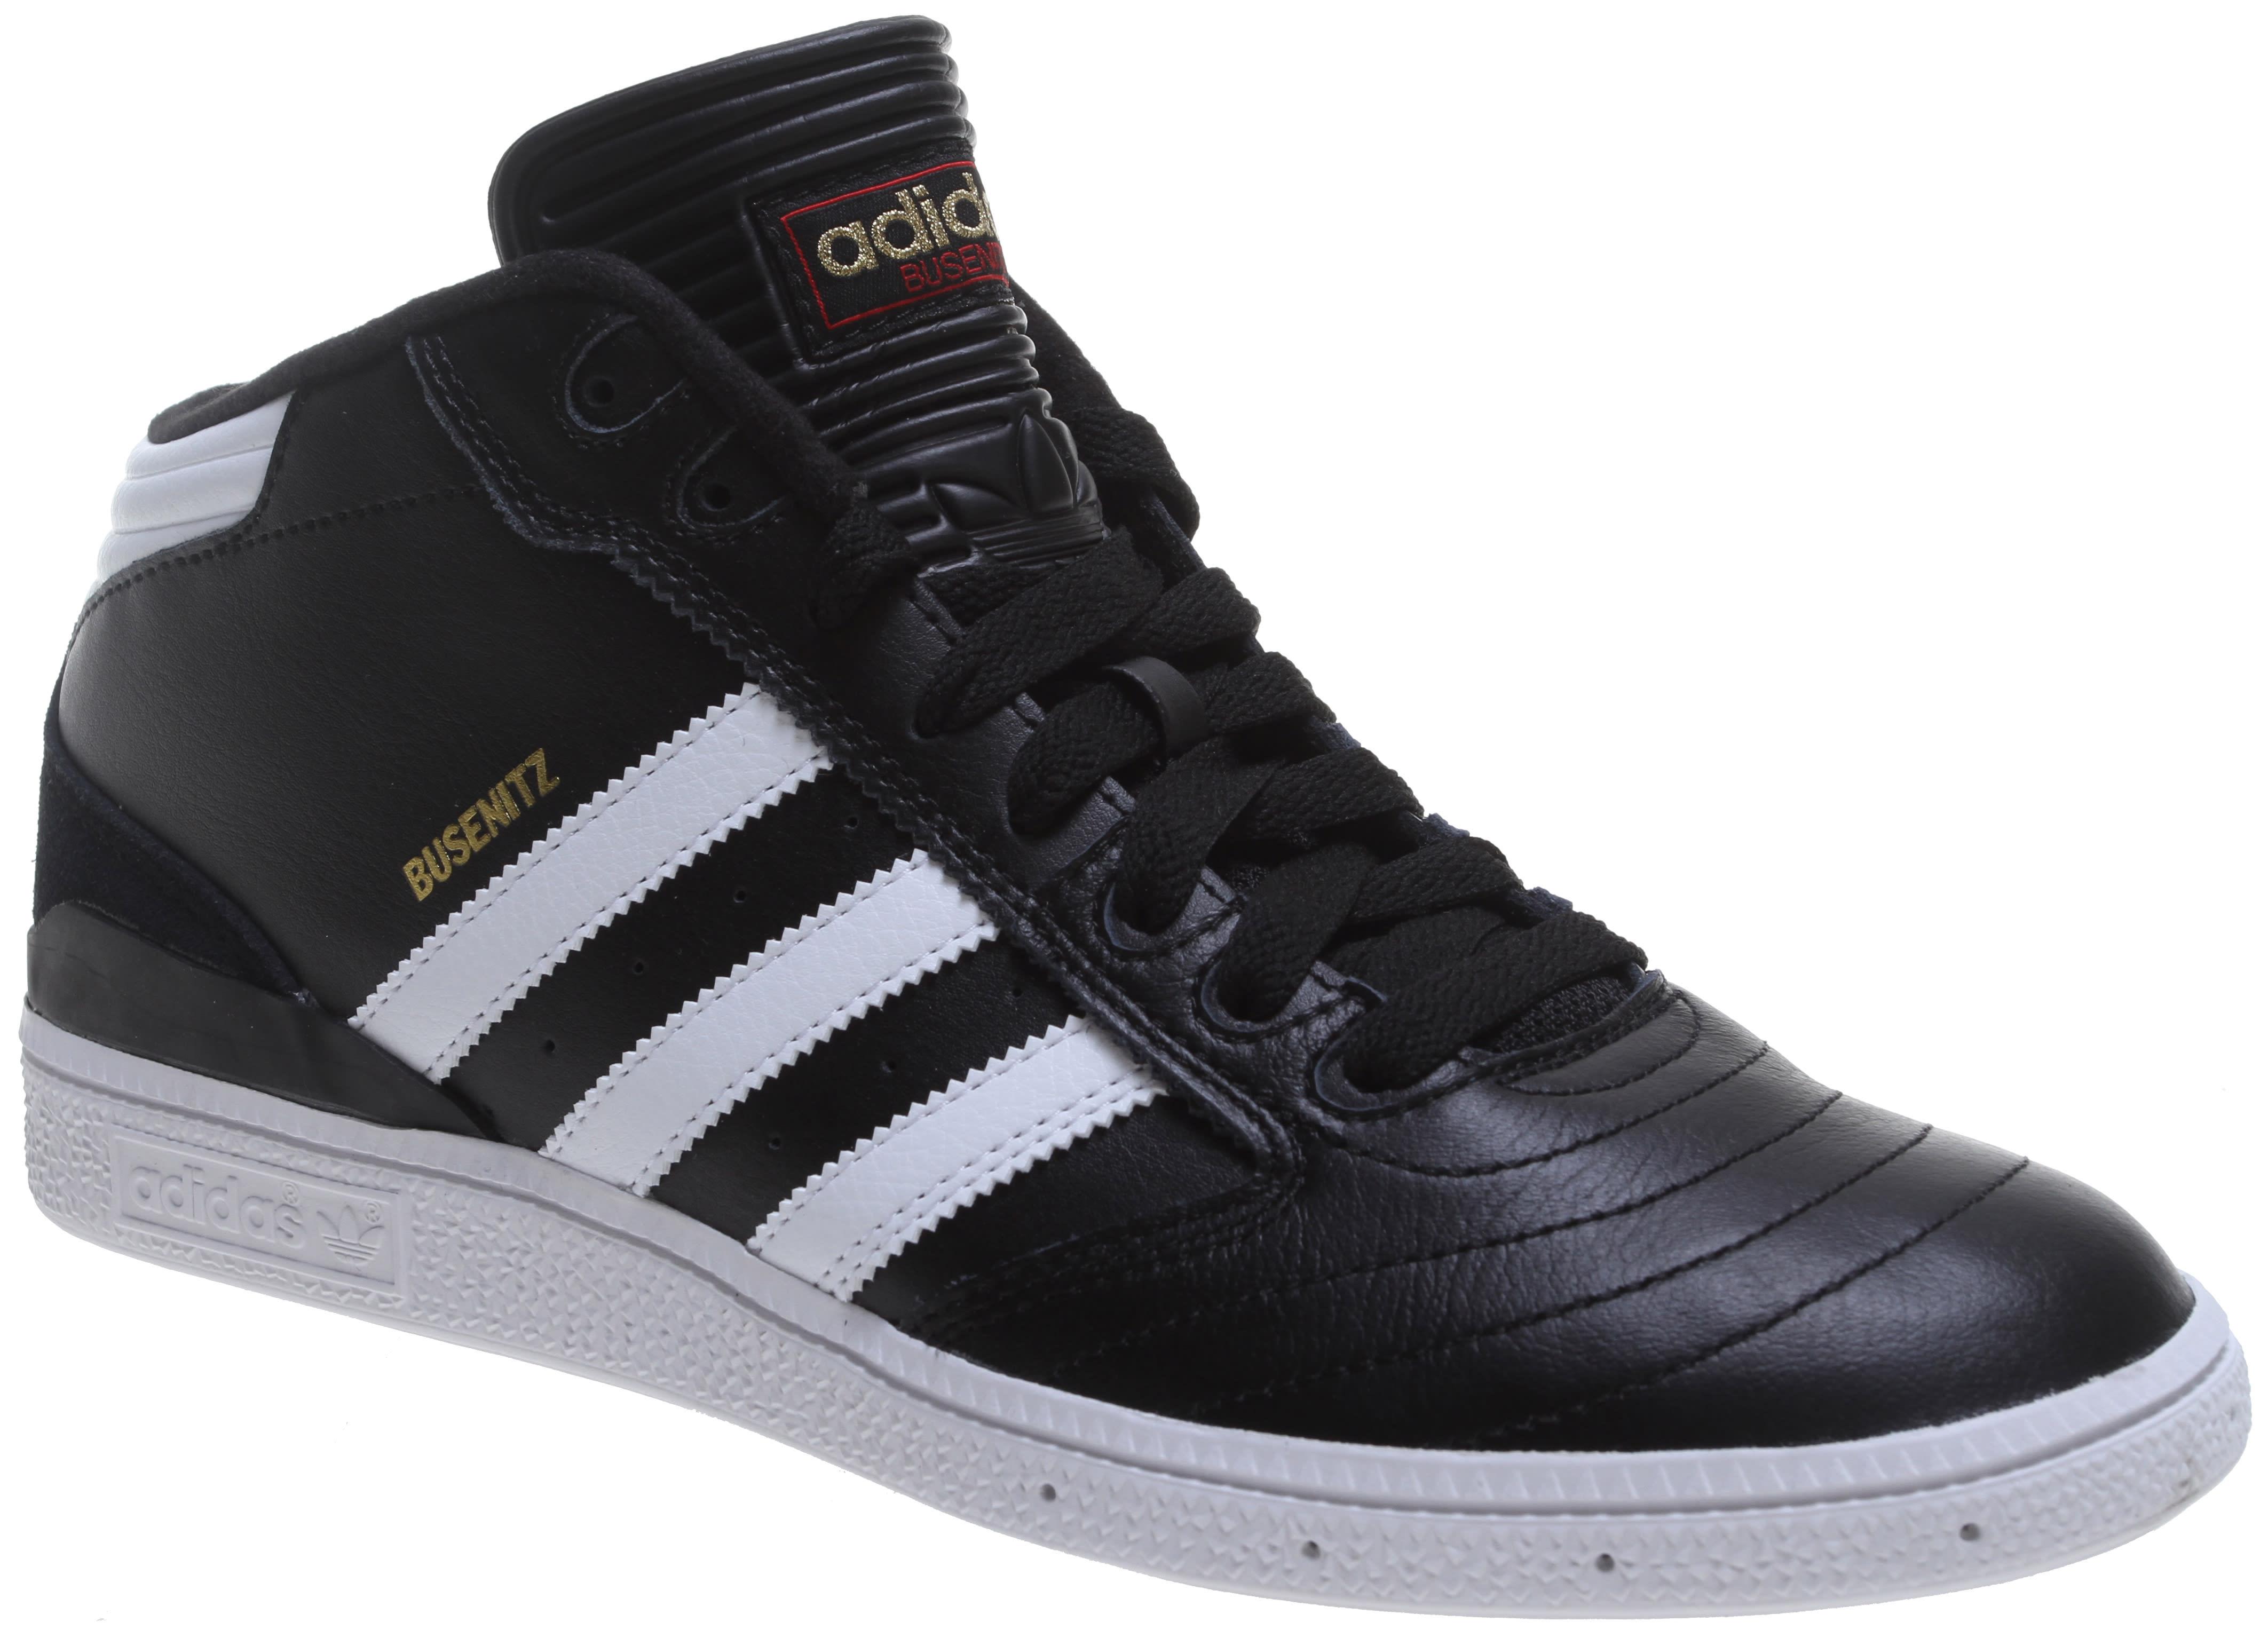 7545df399 best service 9ca60 b0e77 adidas busenitz pro multi color ...